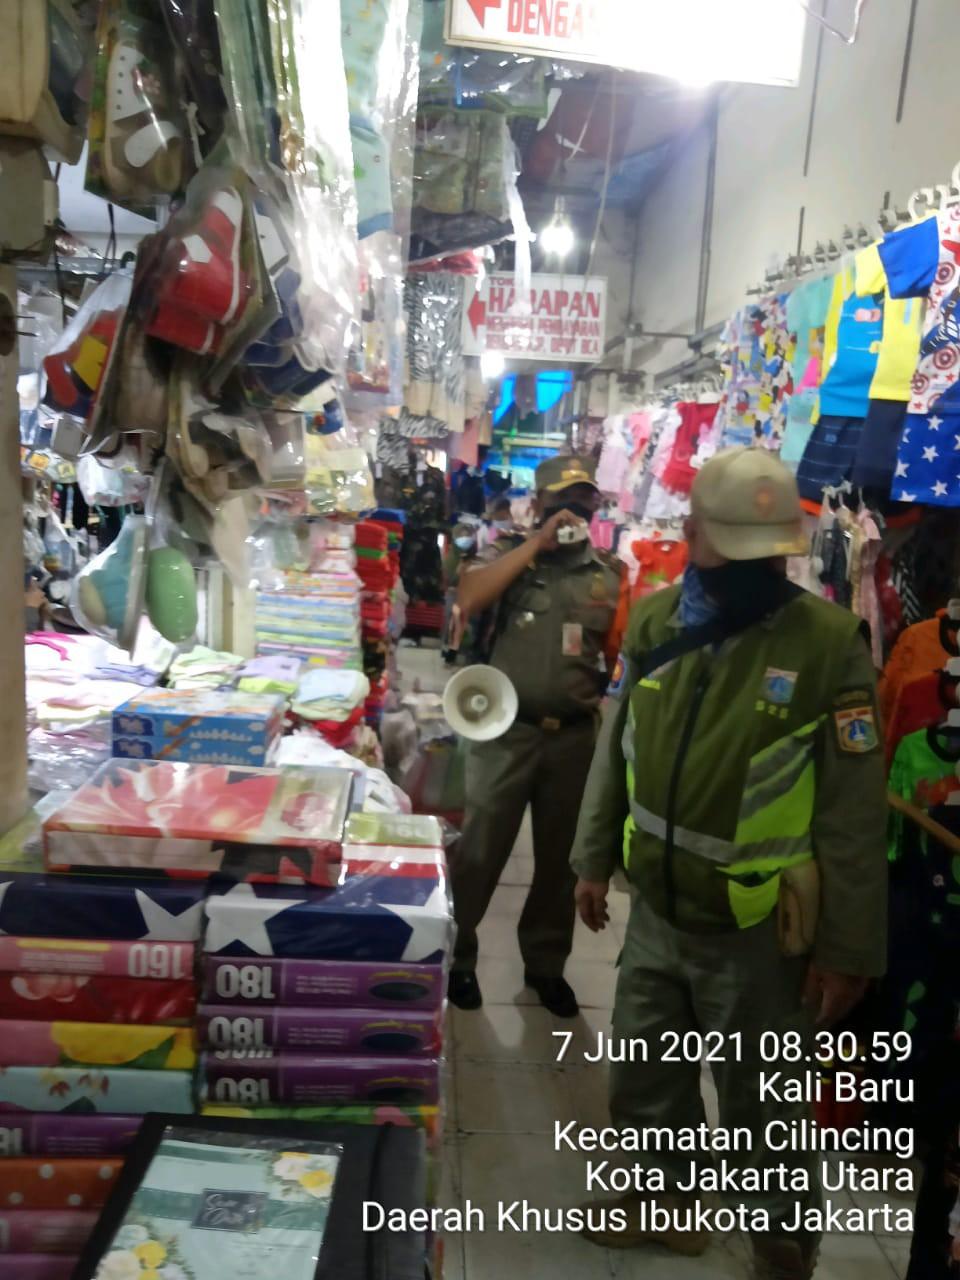 Keliling Pasar Gunakan Megafon, Satpol PP Kelurahan Kalibaru Ingatkan Protokol Kesehatan